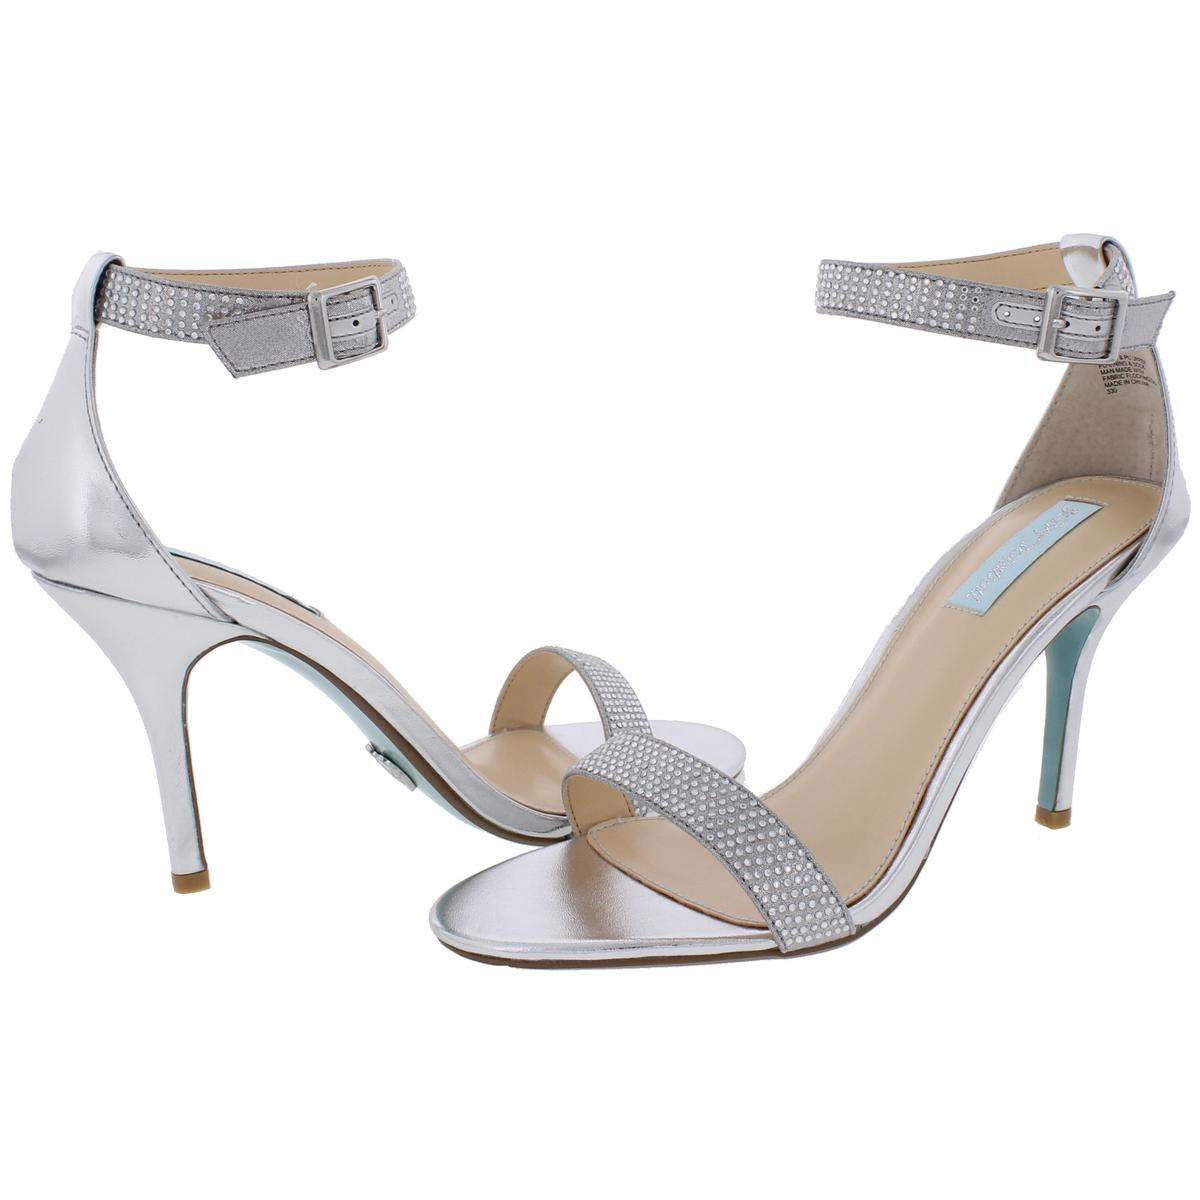 Blue-by-Betsey-Johnson-Womens-Shilo-Studded-Heels-Dress-Sandals-Shoes-BHFO-0493 thumbnail 13